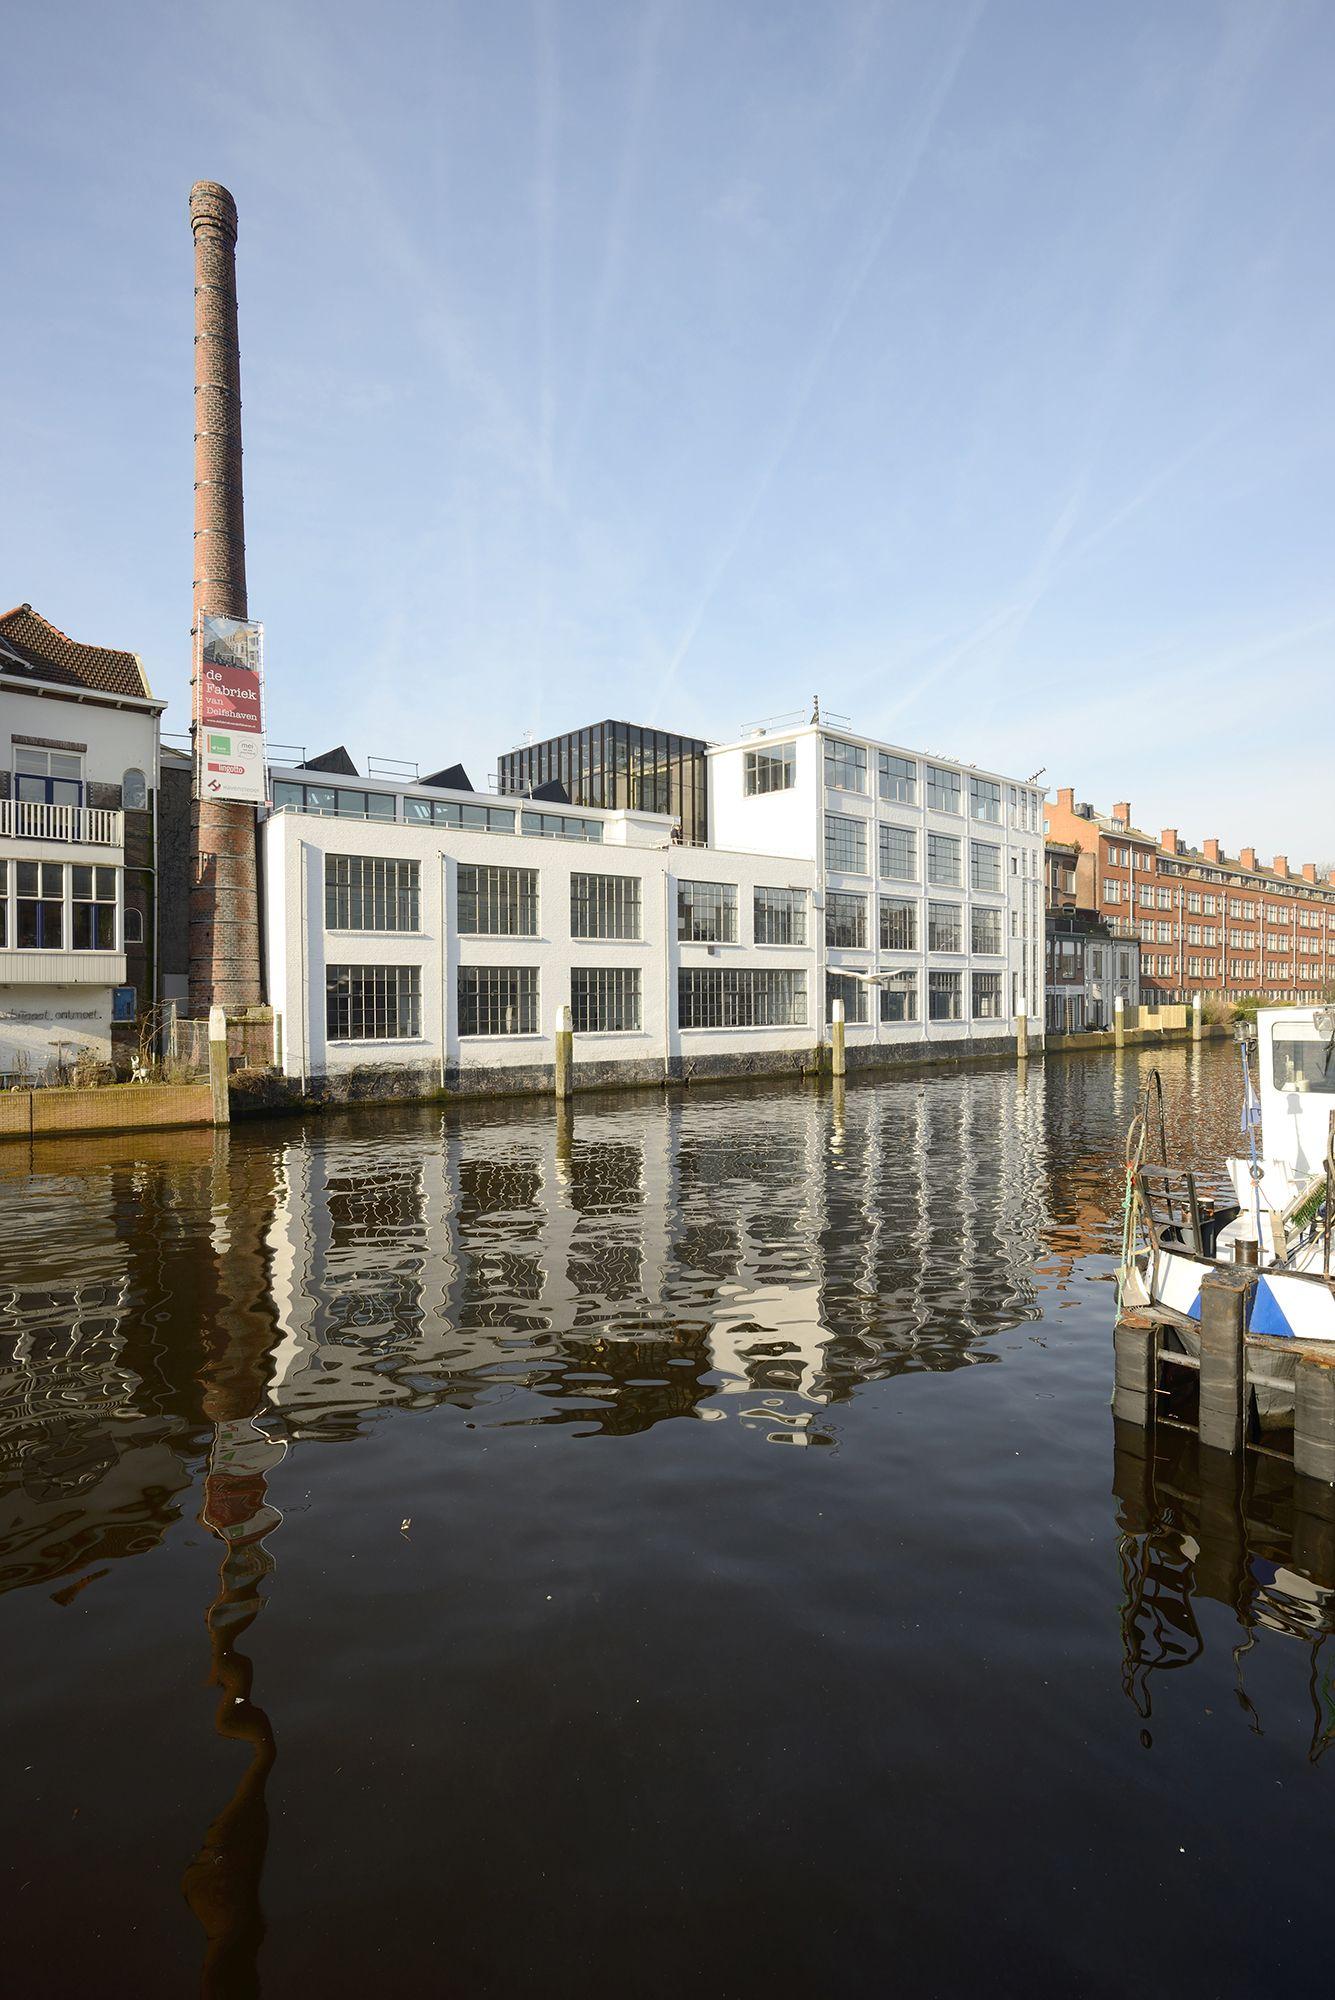 Rotterdam Netherlands Unilever Headquarters 30 min SE of Hague Netherlands To Do Pinterest